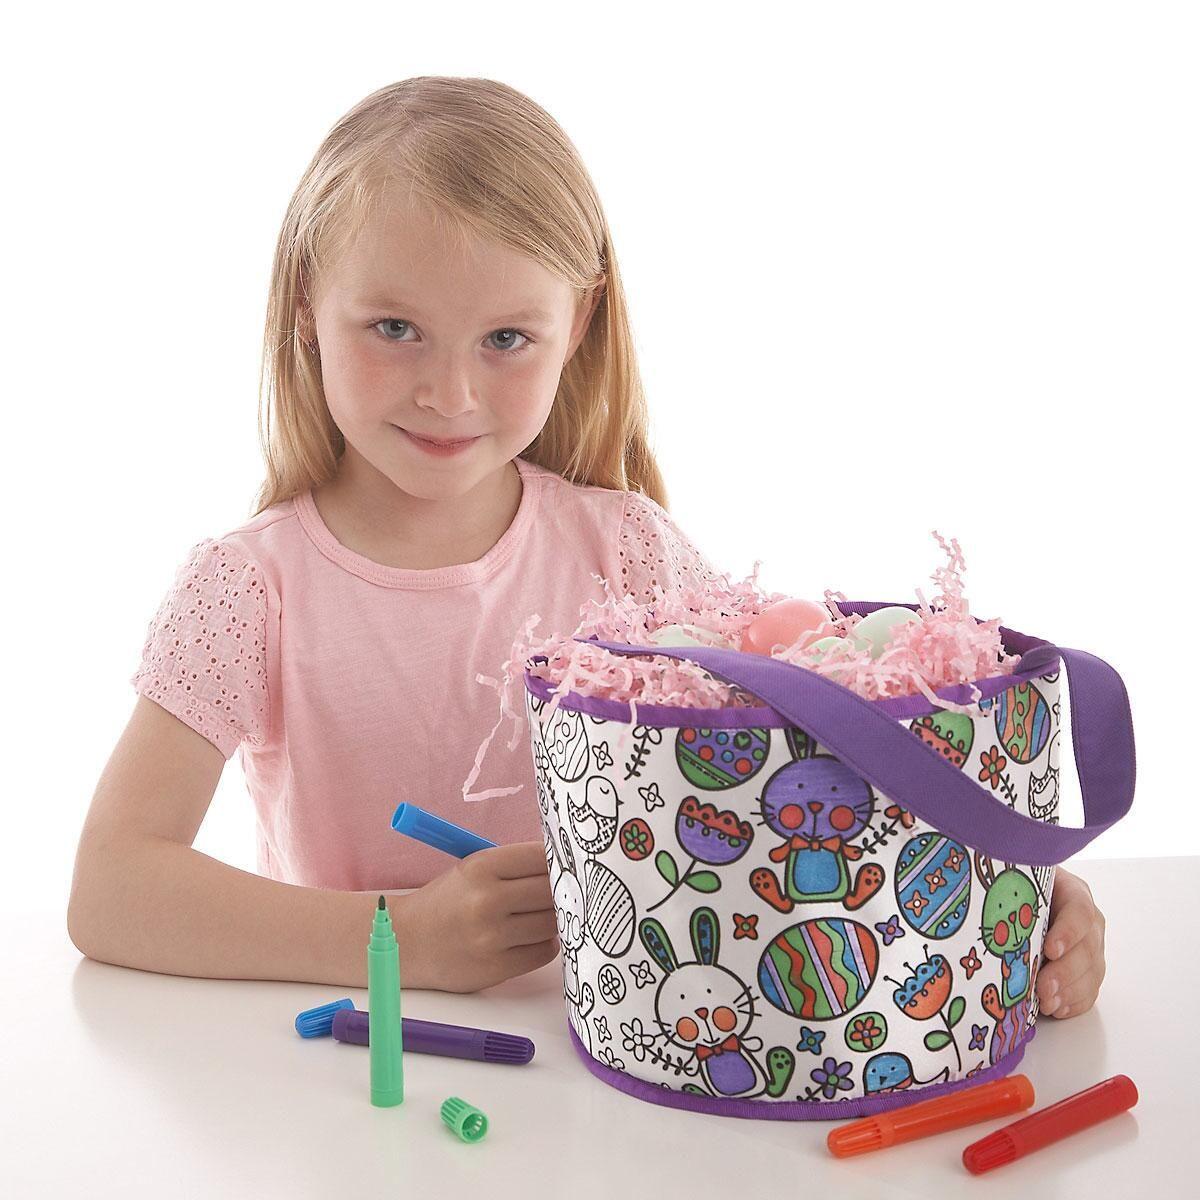 Design Your Own Easter Basket